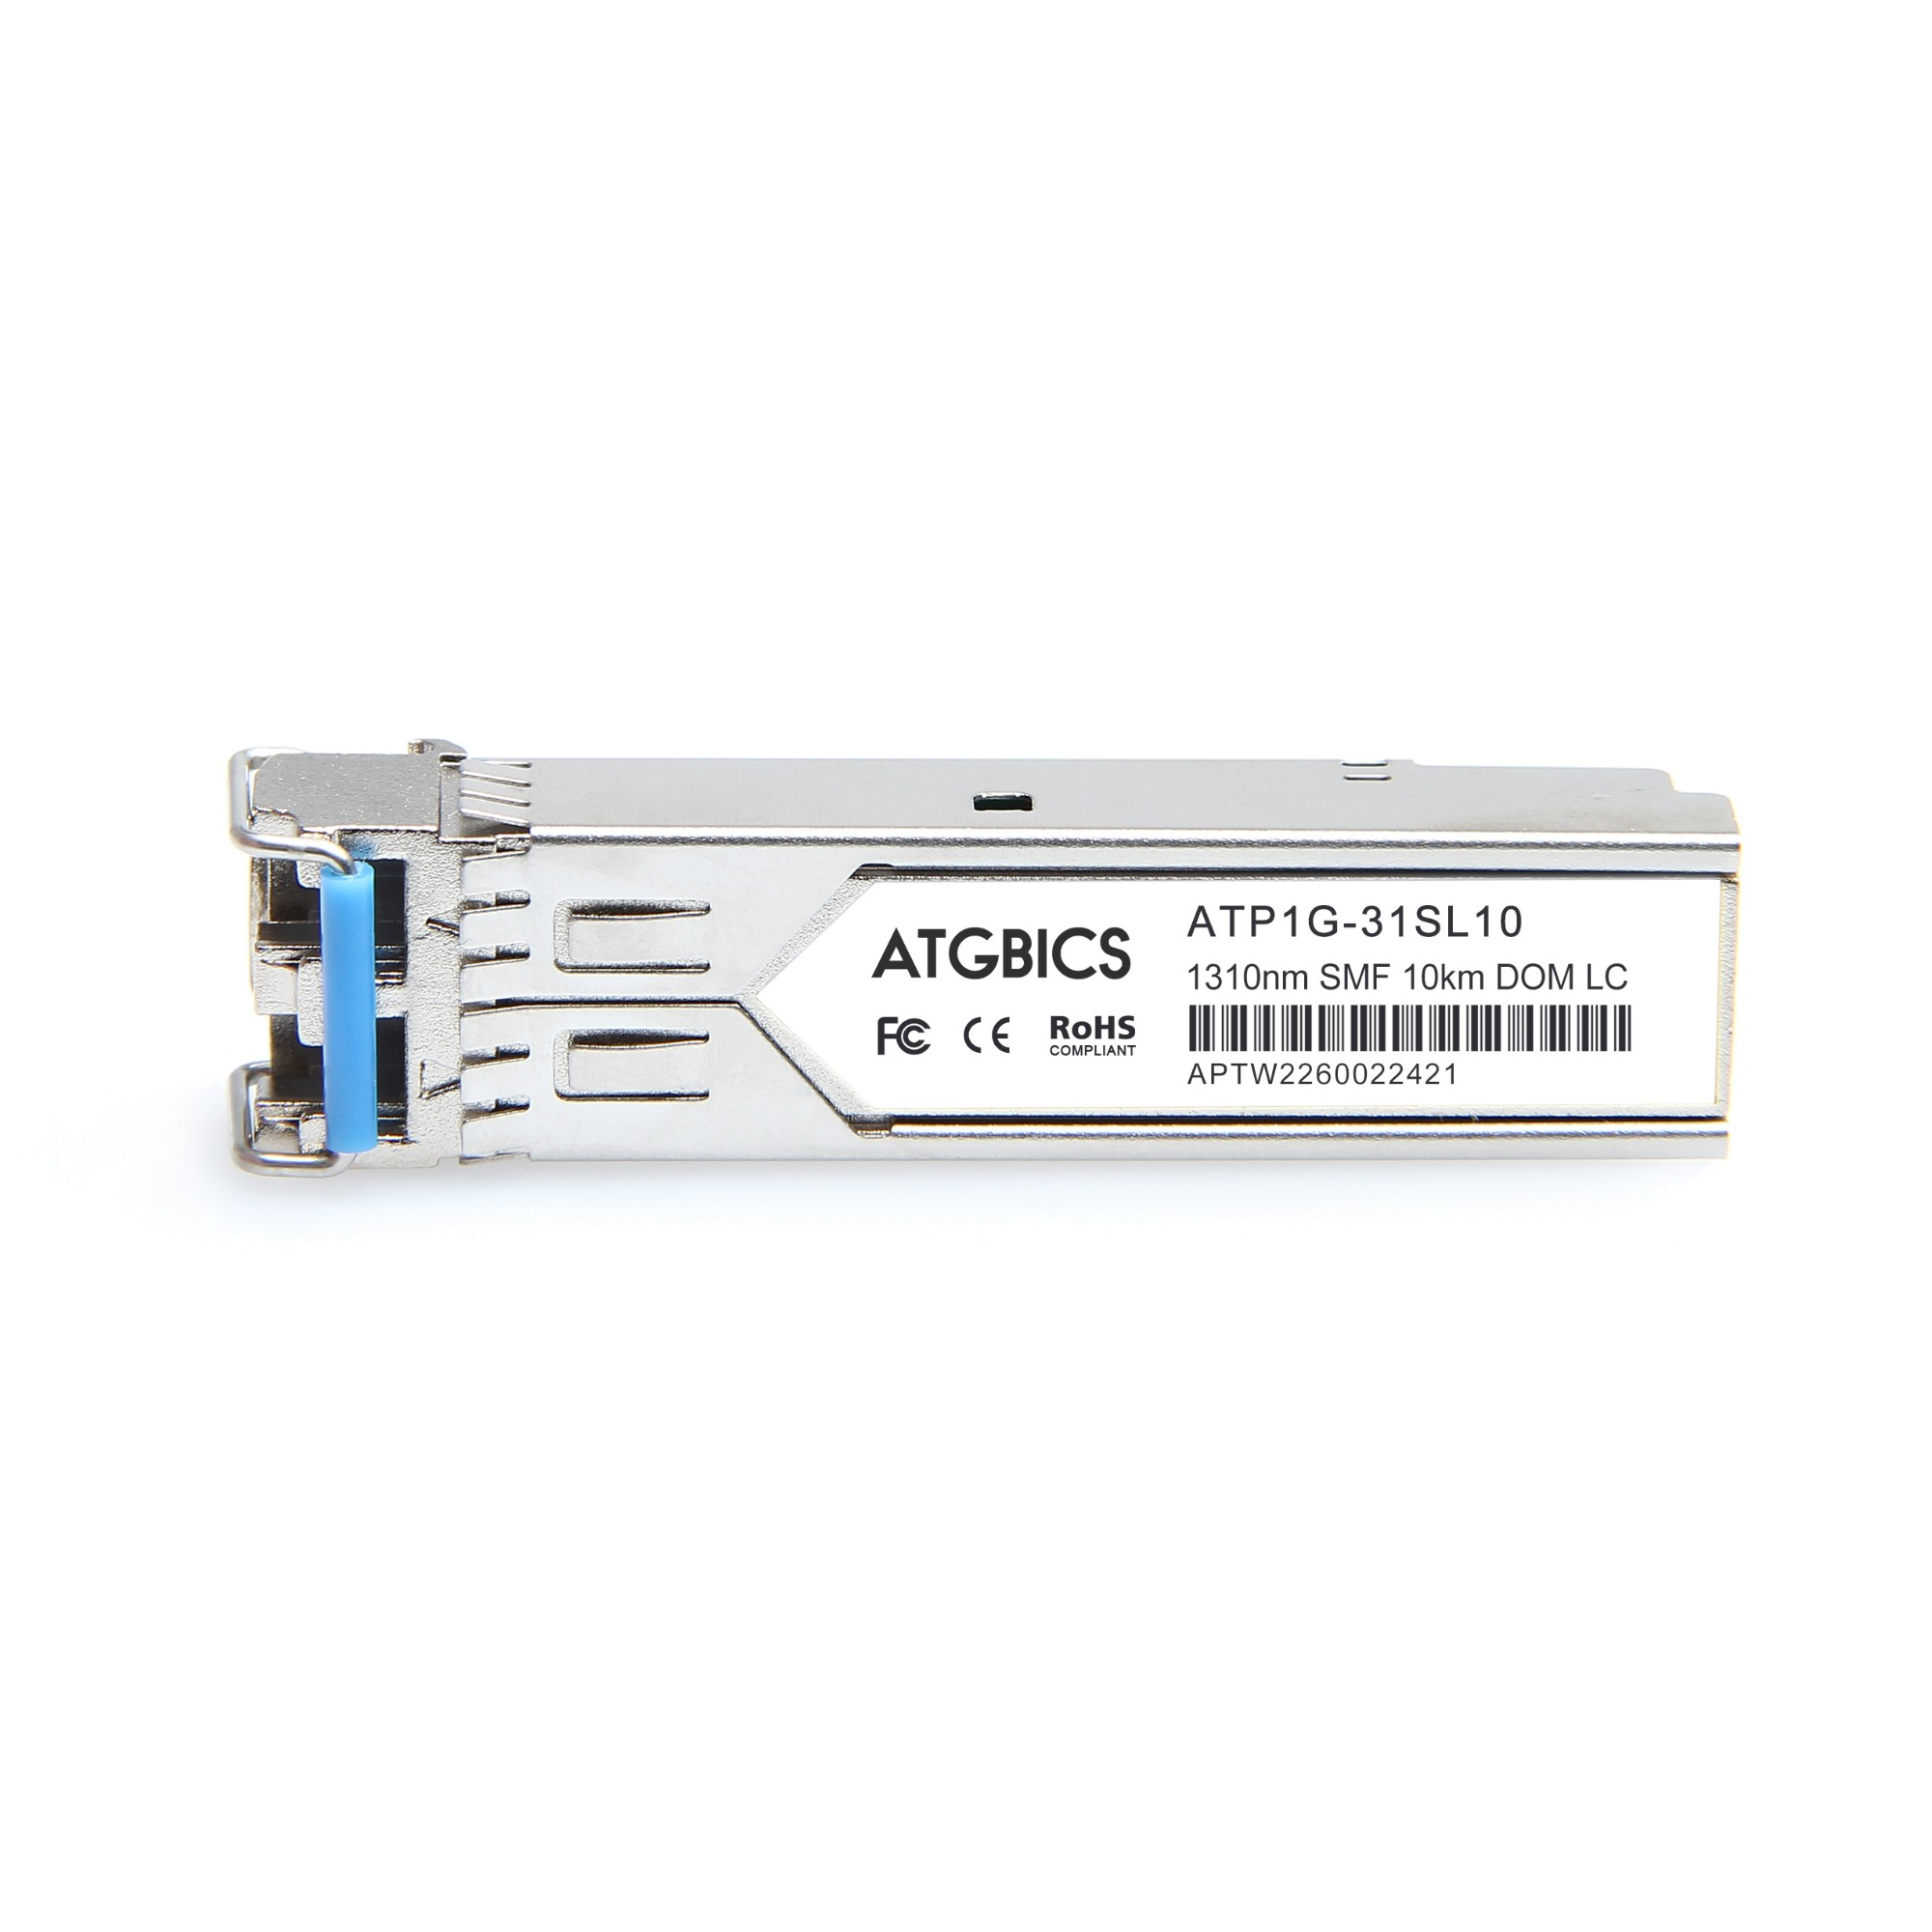 Image of ATGBICS MRV-SFP-GD-LX-C network transceiver module Fiber optic 1000 Mbit/s 1310 nm